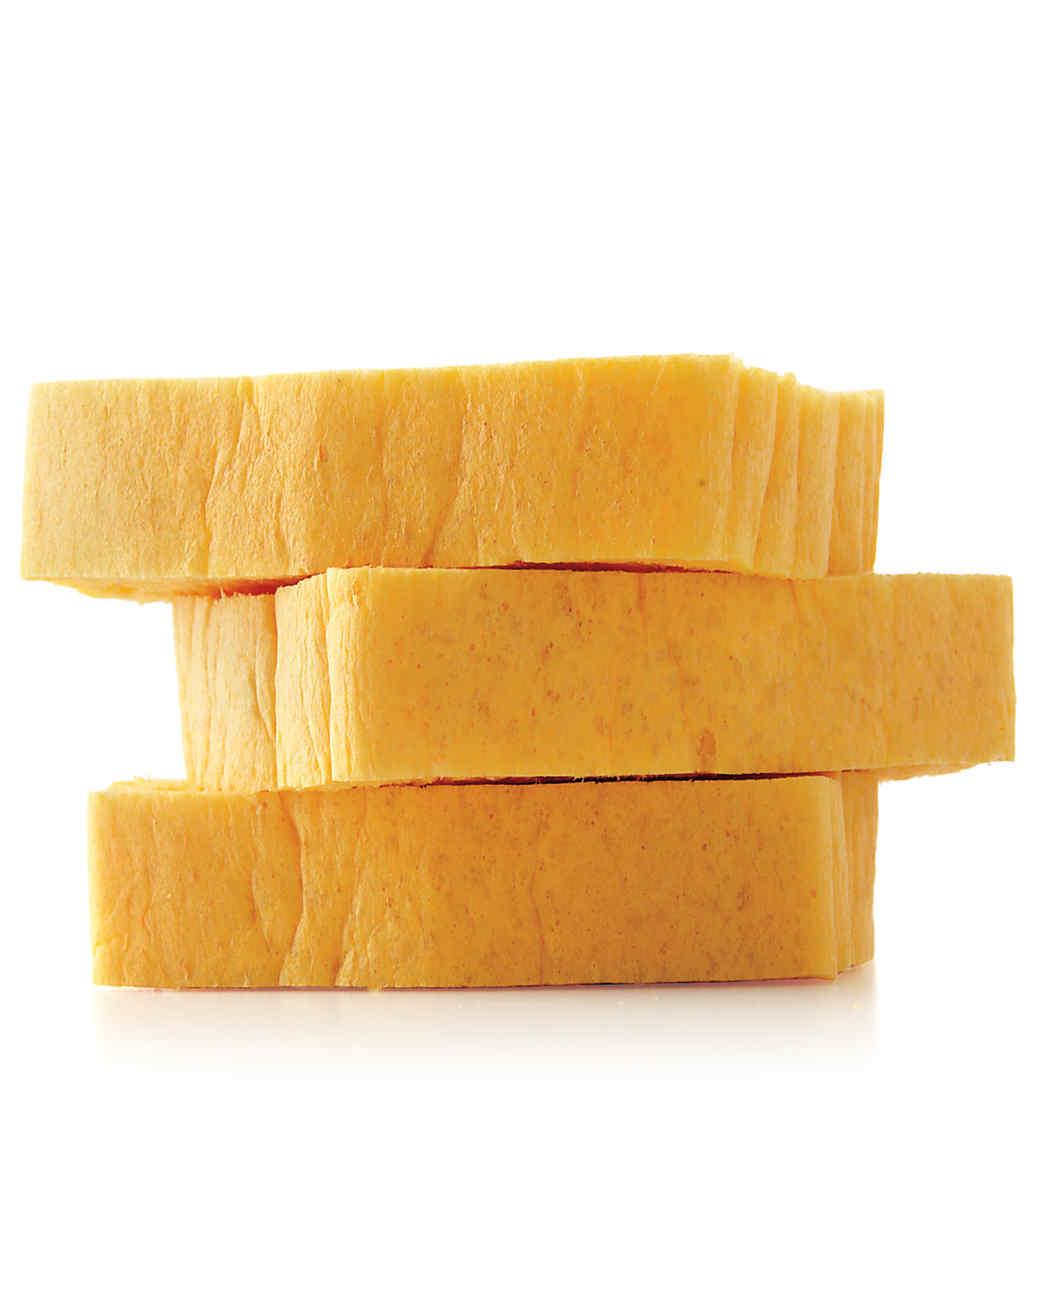 cellulose-sponges-mld108211.jpg